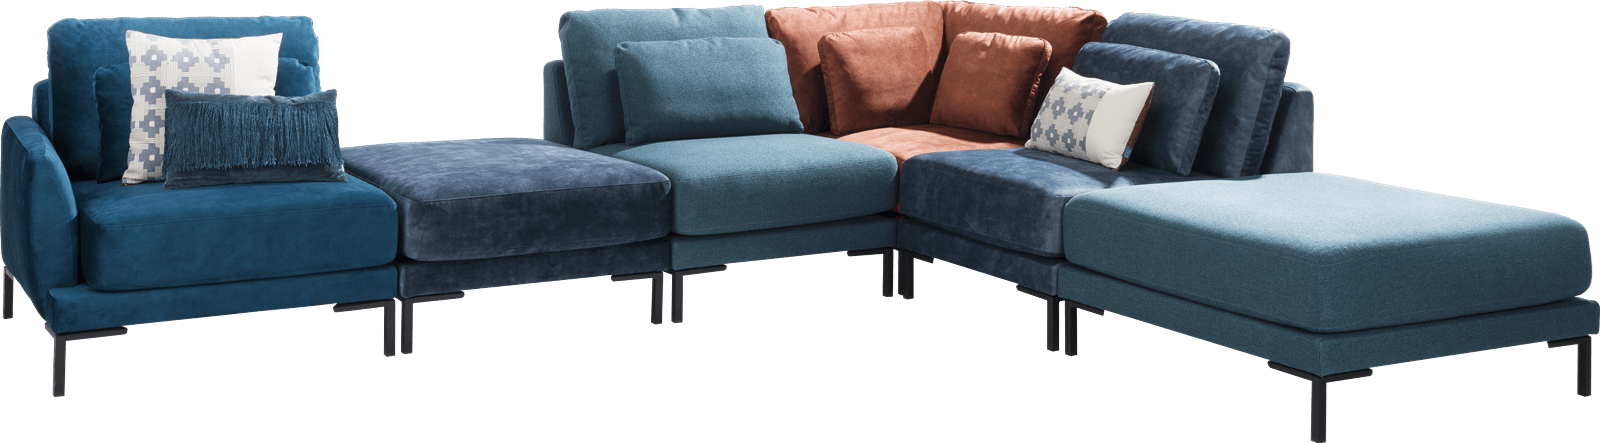 XOOON - Toledos - Minimalistisch design - 1-zits arm links - 80 cm